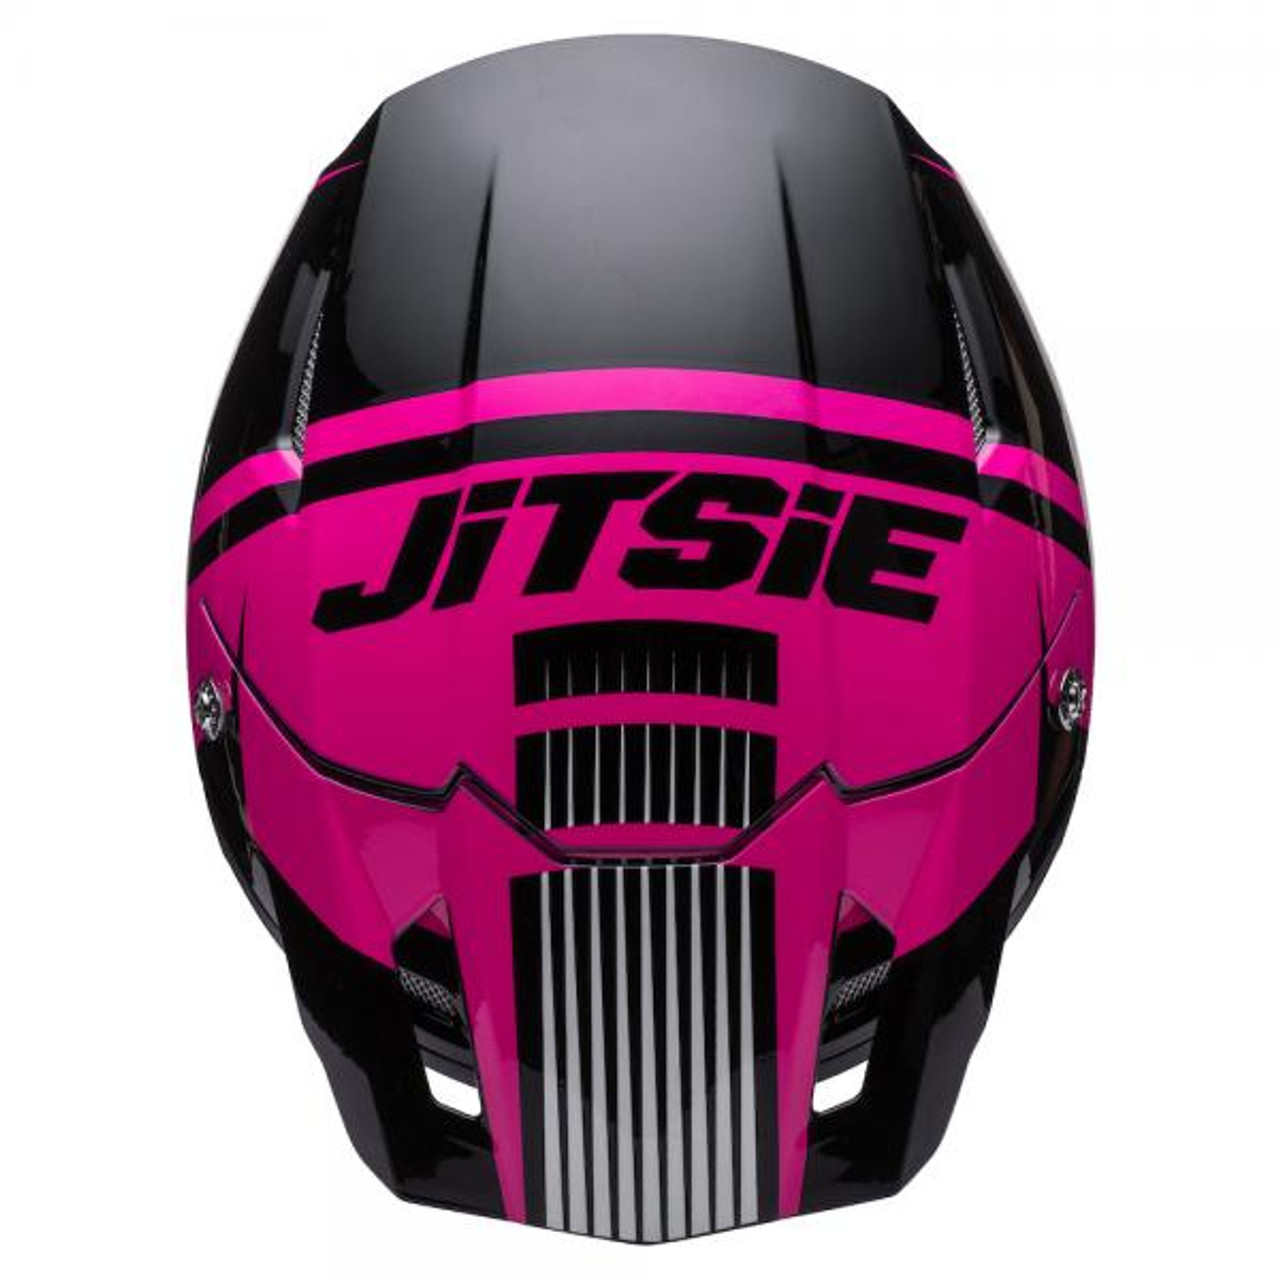 Helmet HT1 Struktur, black/ fluo pink